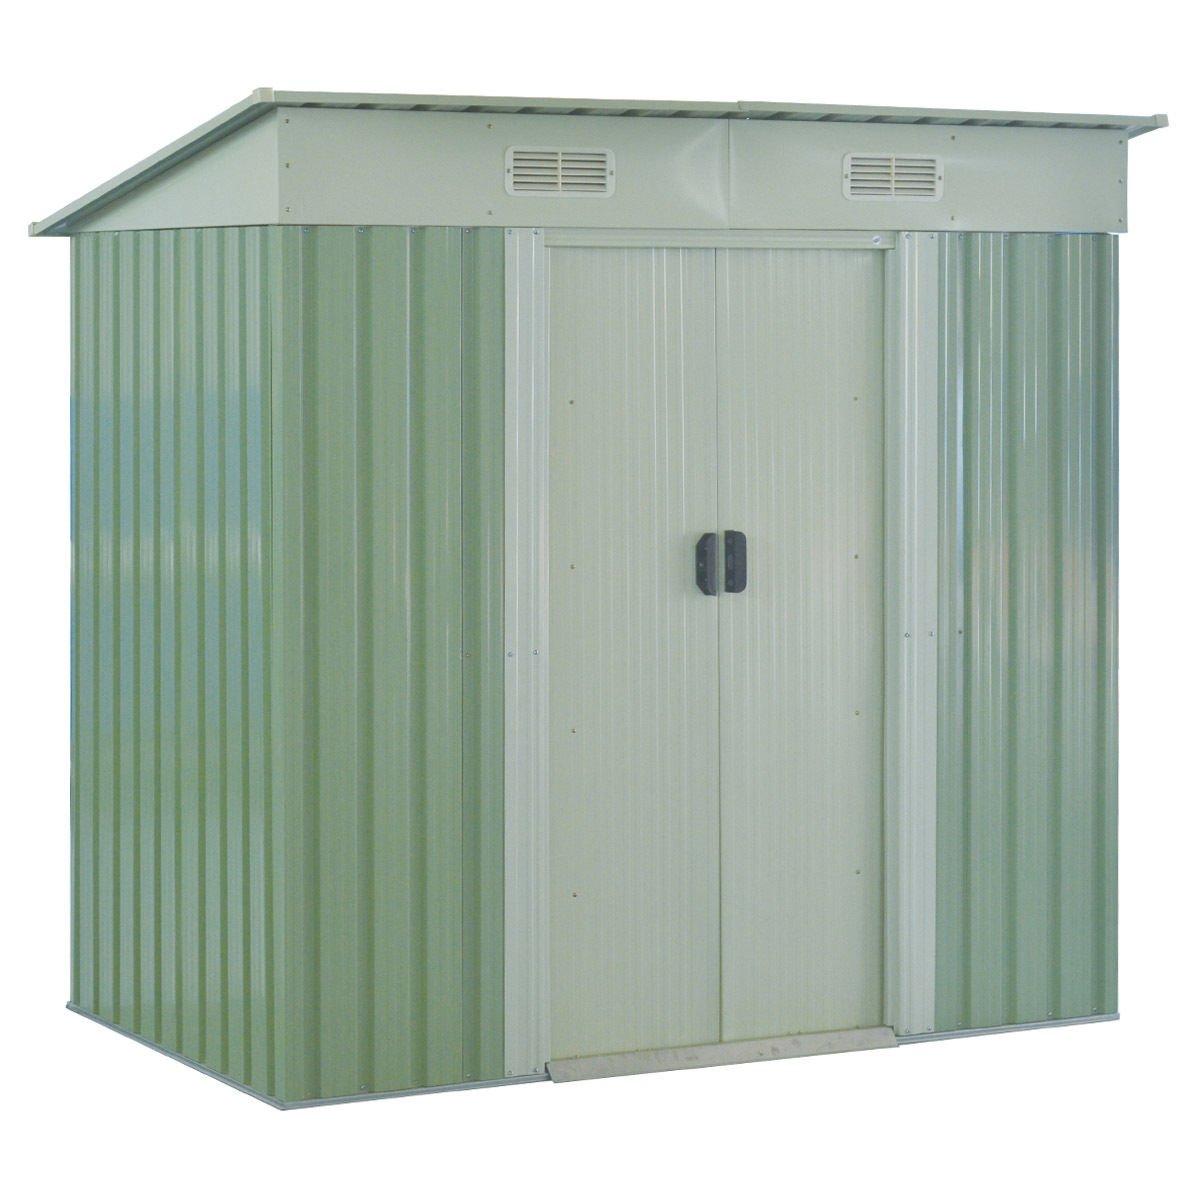 Goplus Garden Storage Shed Galvanized Steel Outdoor Tool House 4 x 6.2 Ft Heavy Duty W/ Sliding Door (Green)